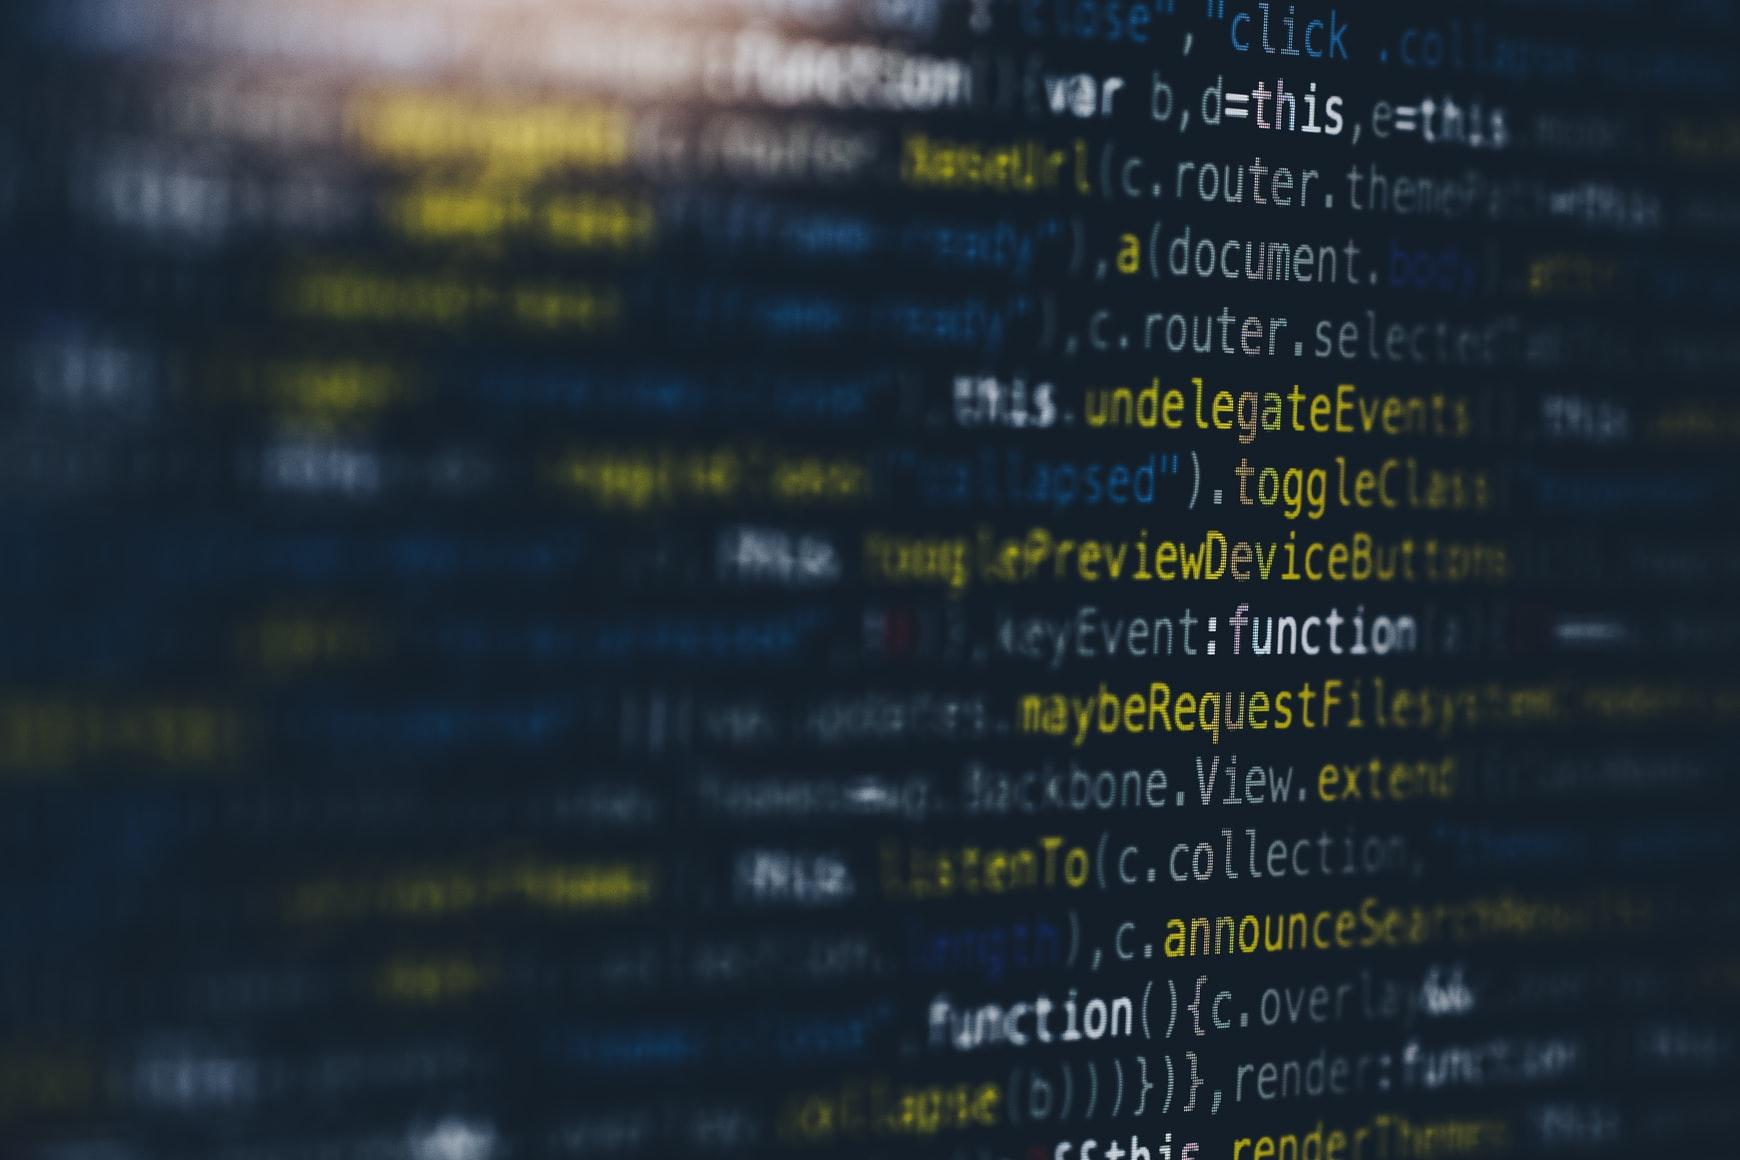 Dosen Teknologi Sains Data: Big Data Berpotensi Mempermudah Urusan Manusia dari Segala Aspek